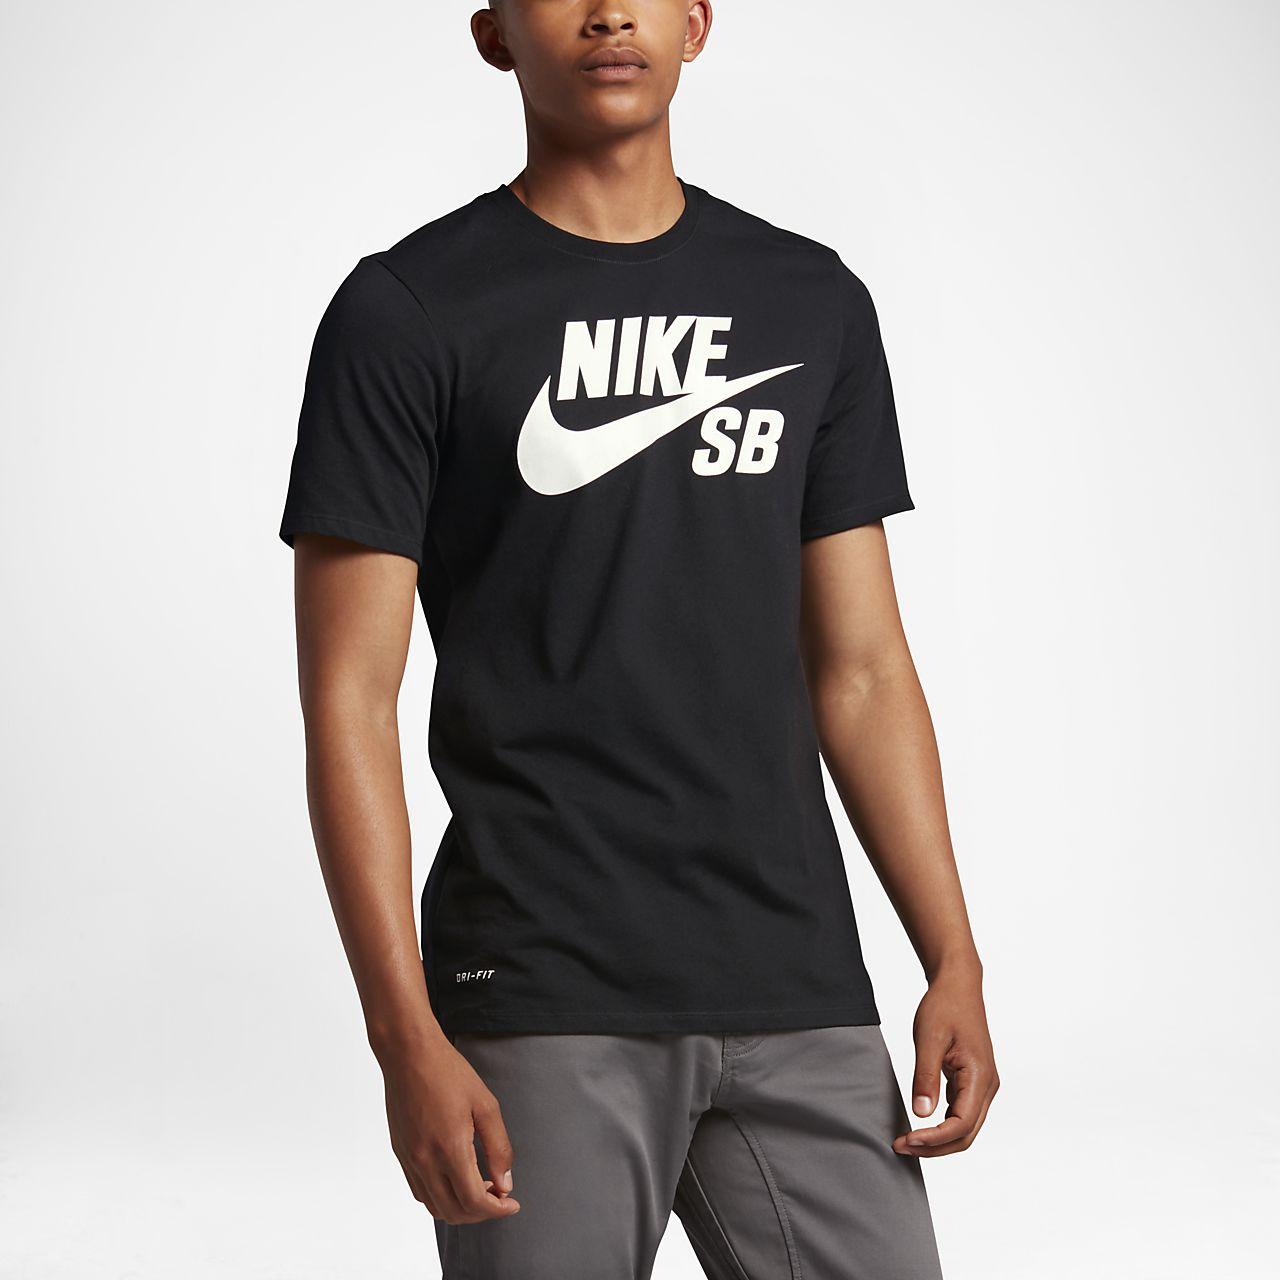 fa33fc00f6ab Nike SB Logo Men s T-Shirt. Nike.com GB